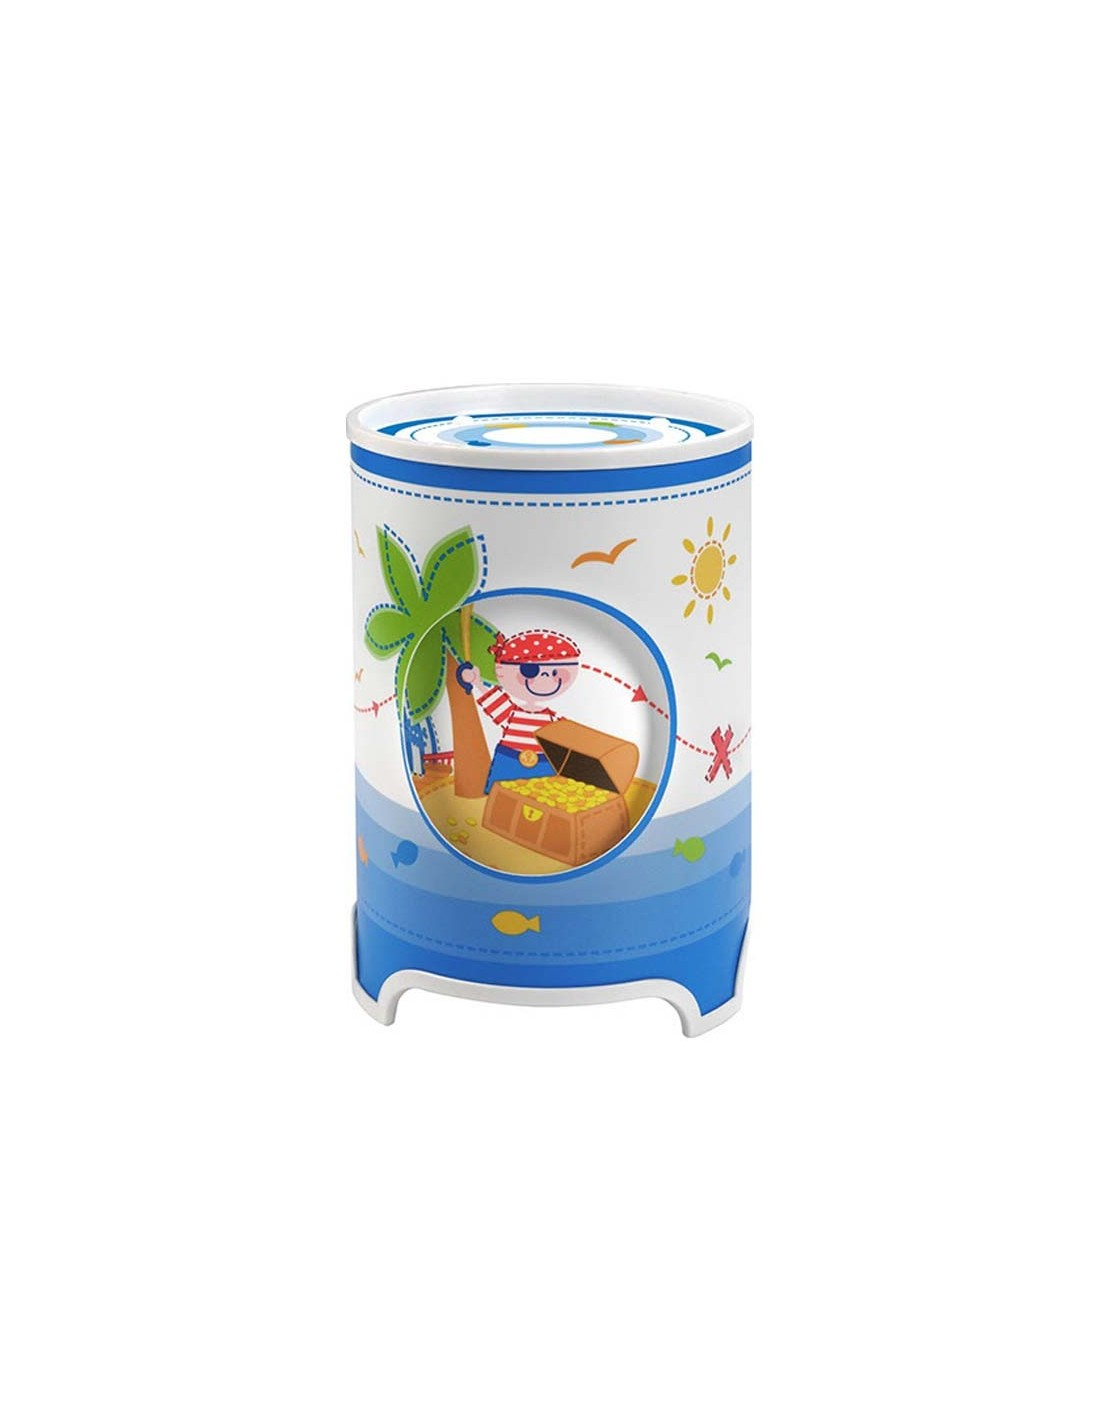 L mpara de sobremesa infantil pirate 60550 dalber for Lampara sobremesa infantil